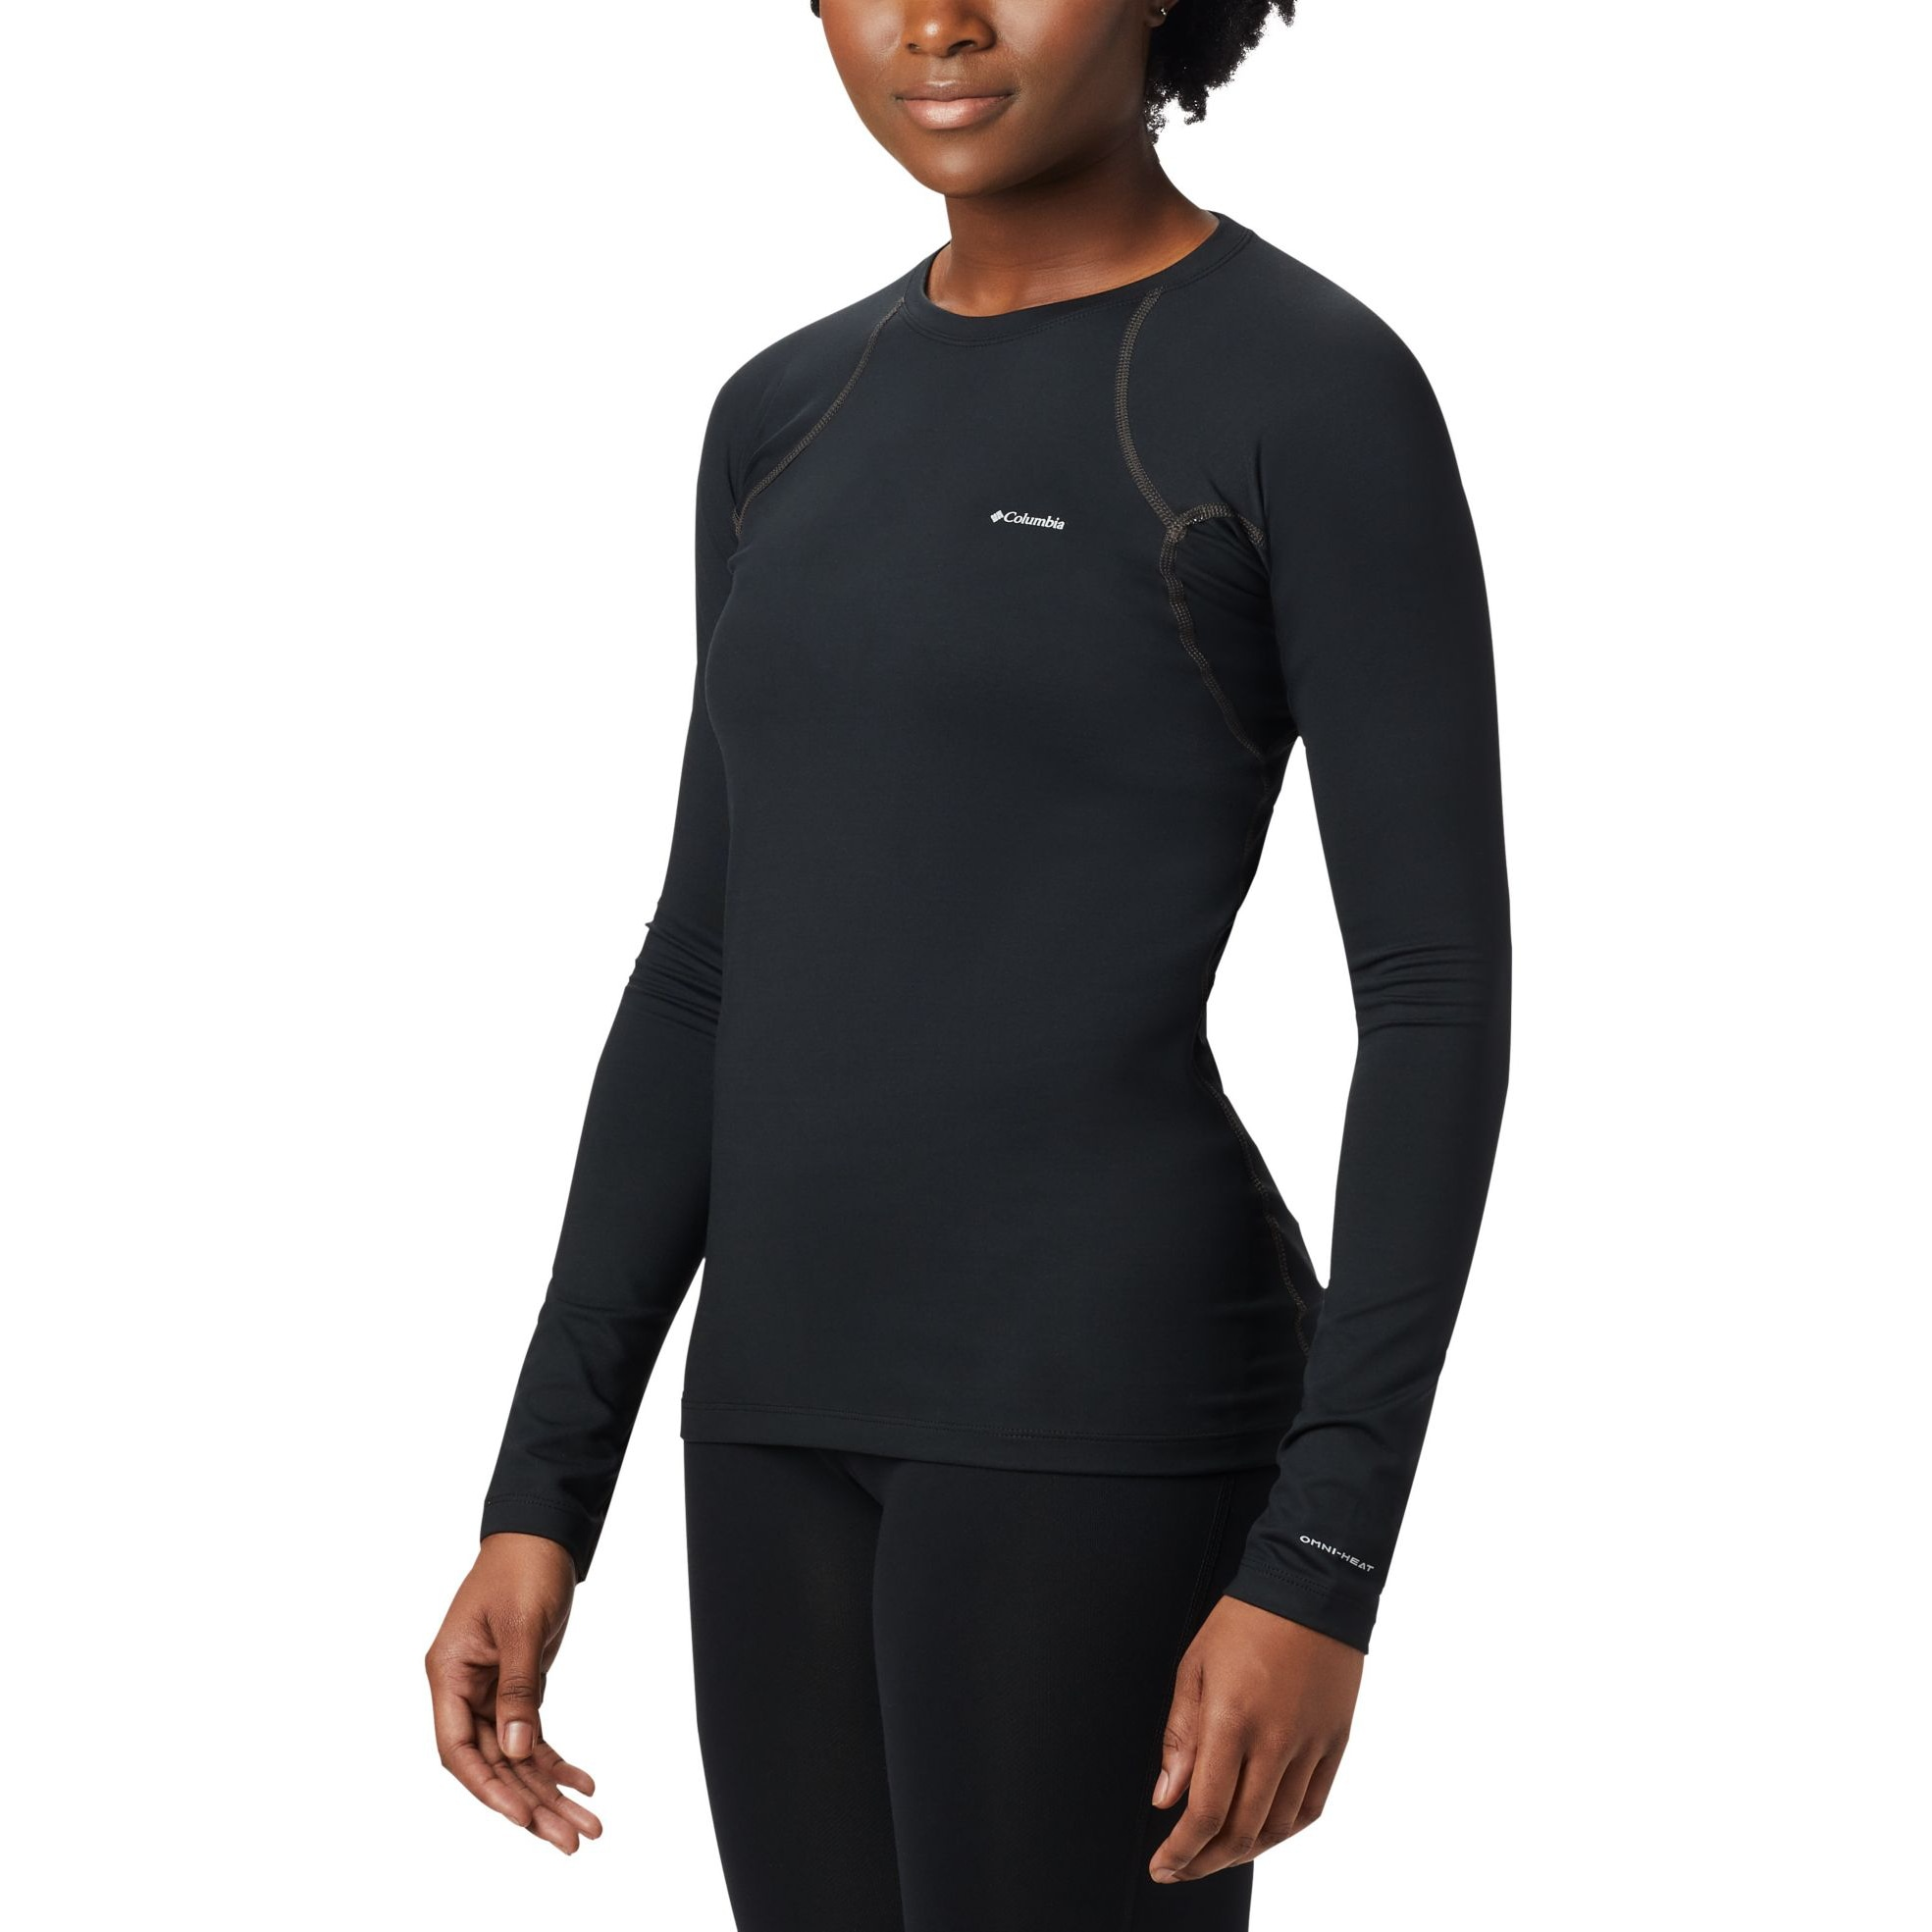 Heavyweight Stretch Top Long Sleeve - Women's